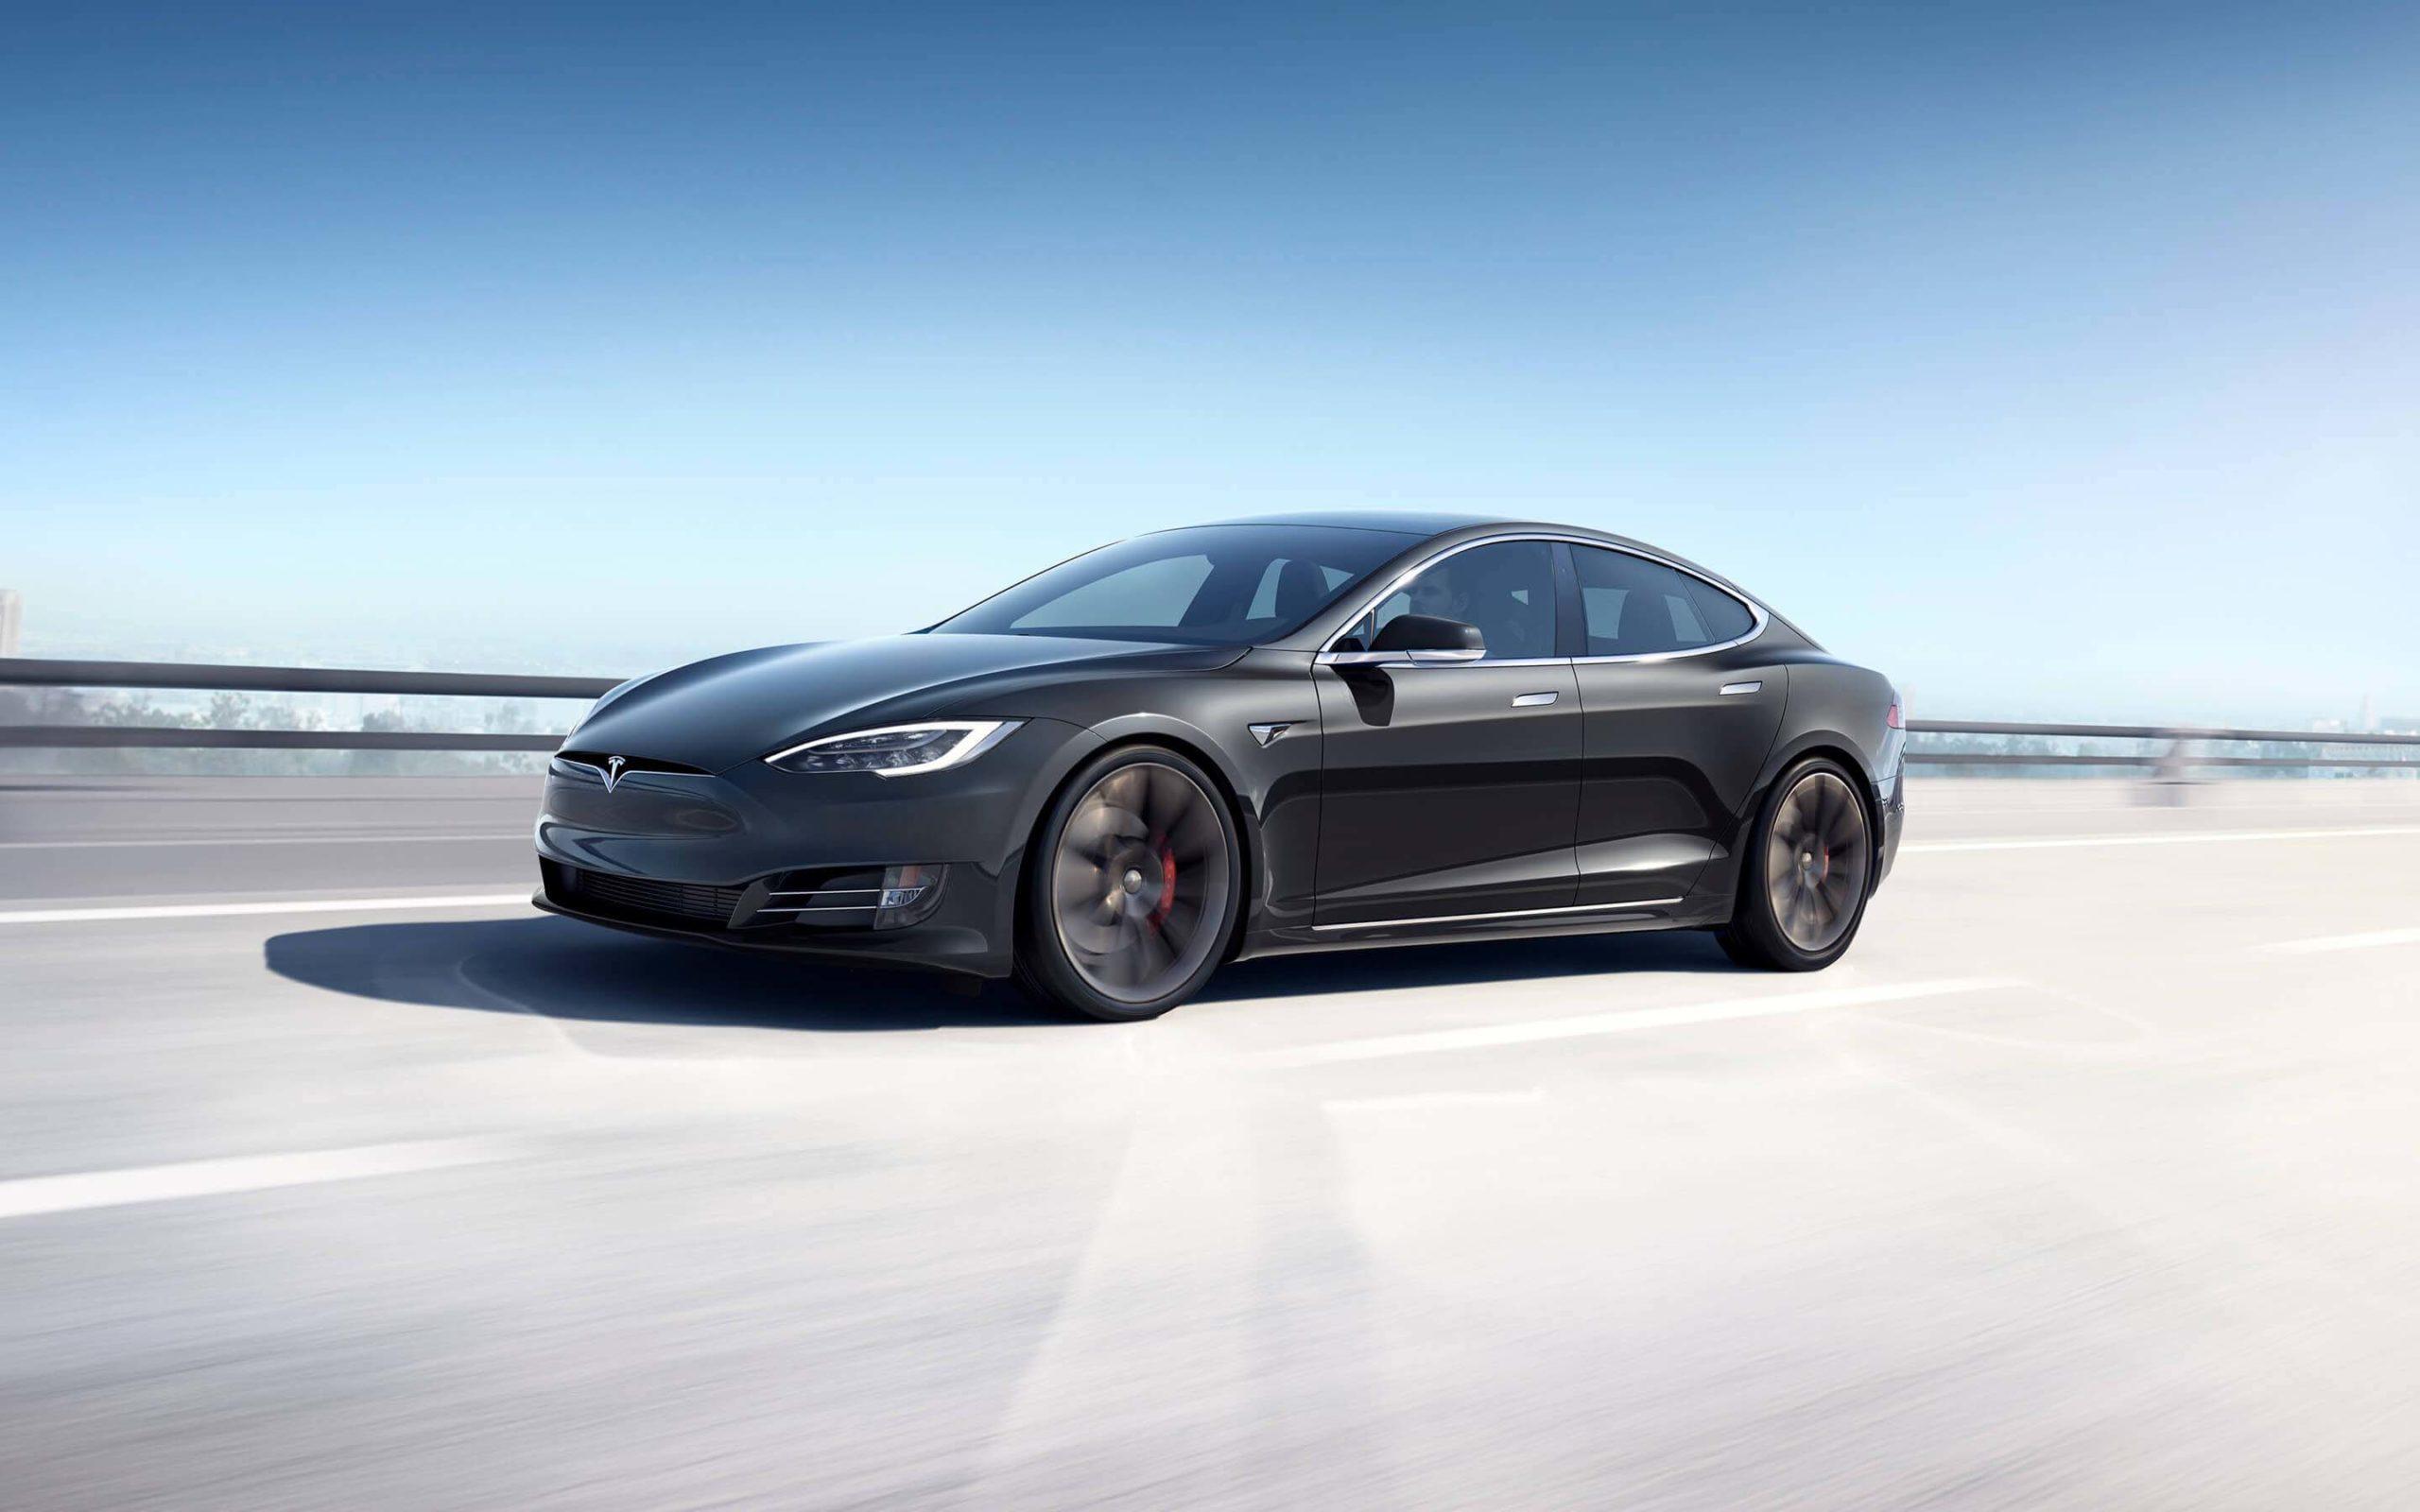 gray Tesla Model S Performance on the freeway